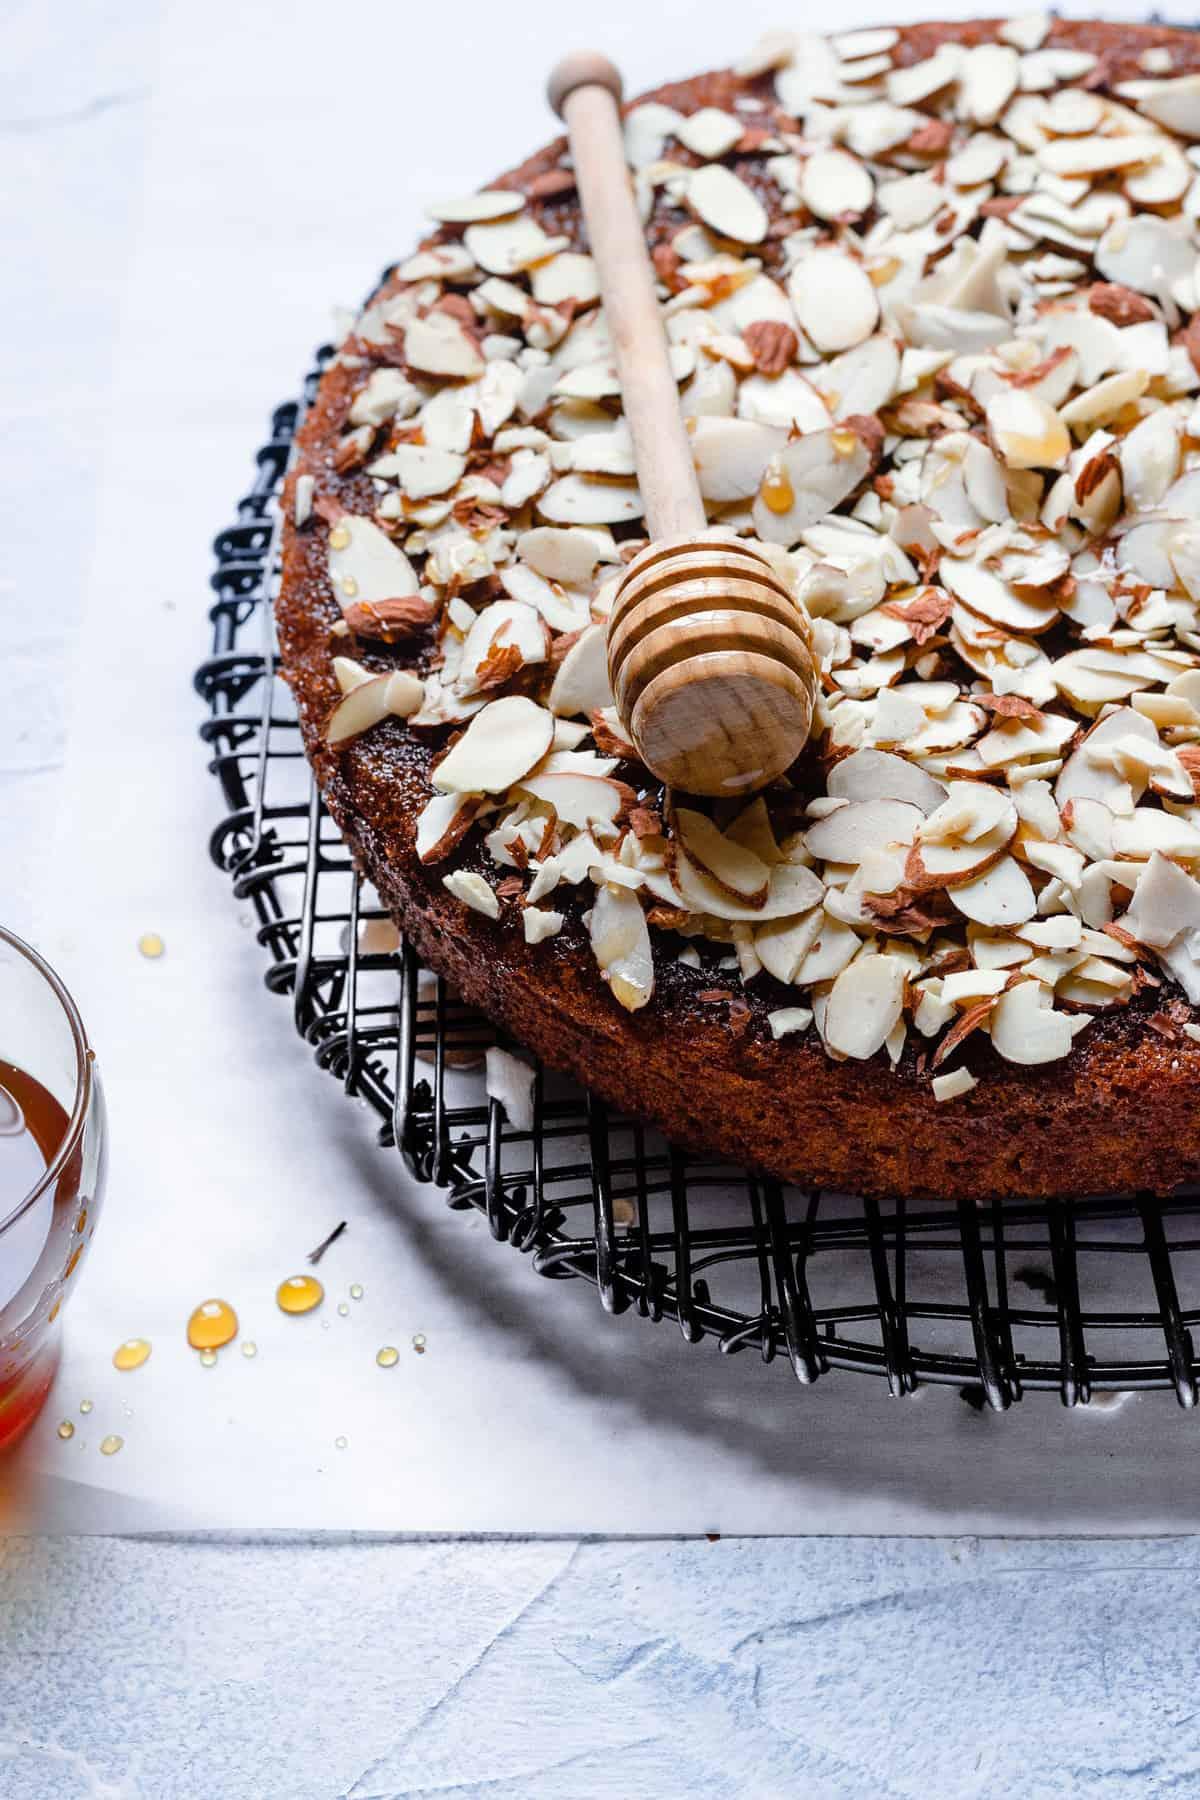 Traditional Jewish honey cake with almonds.